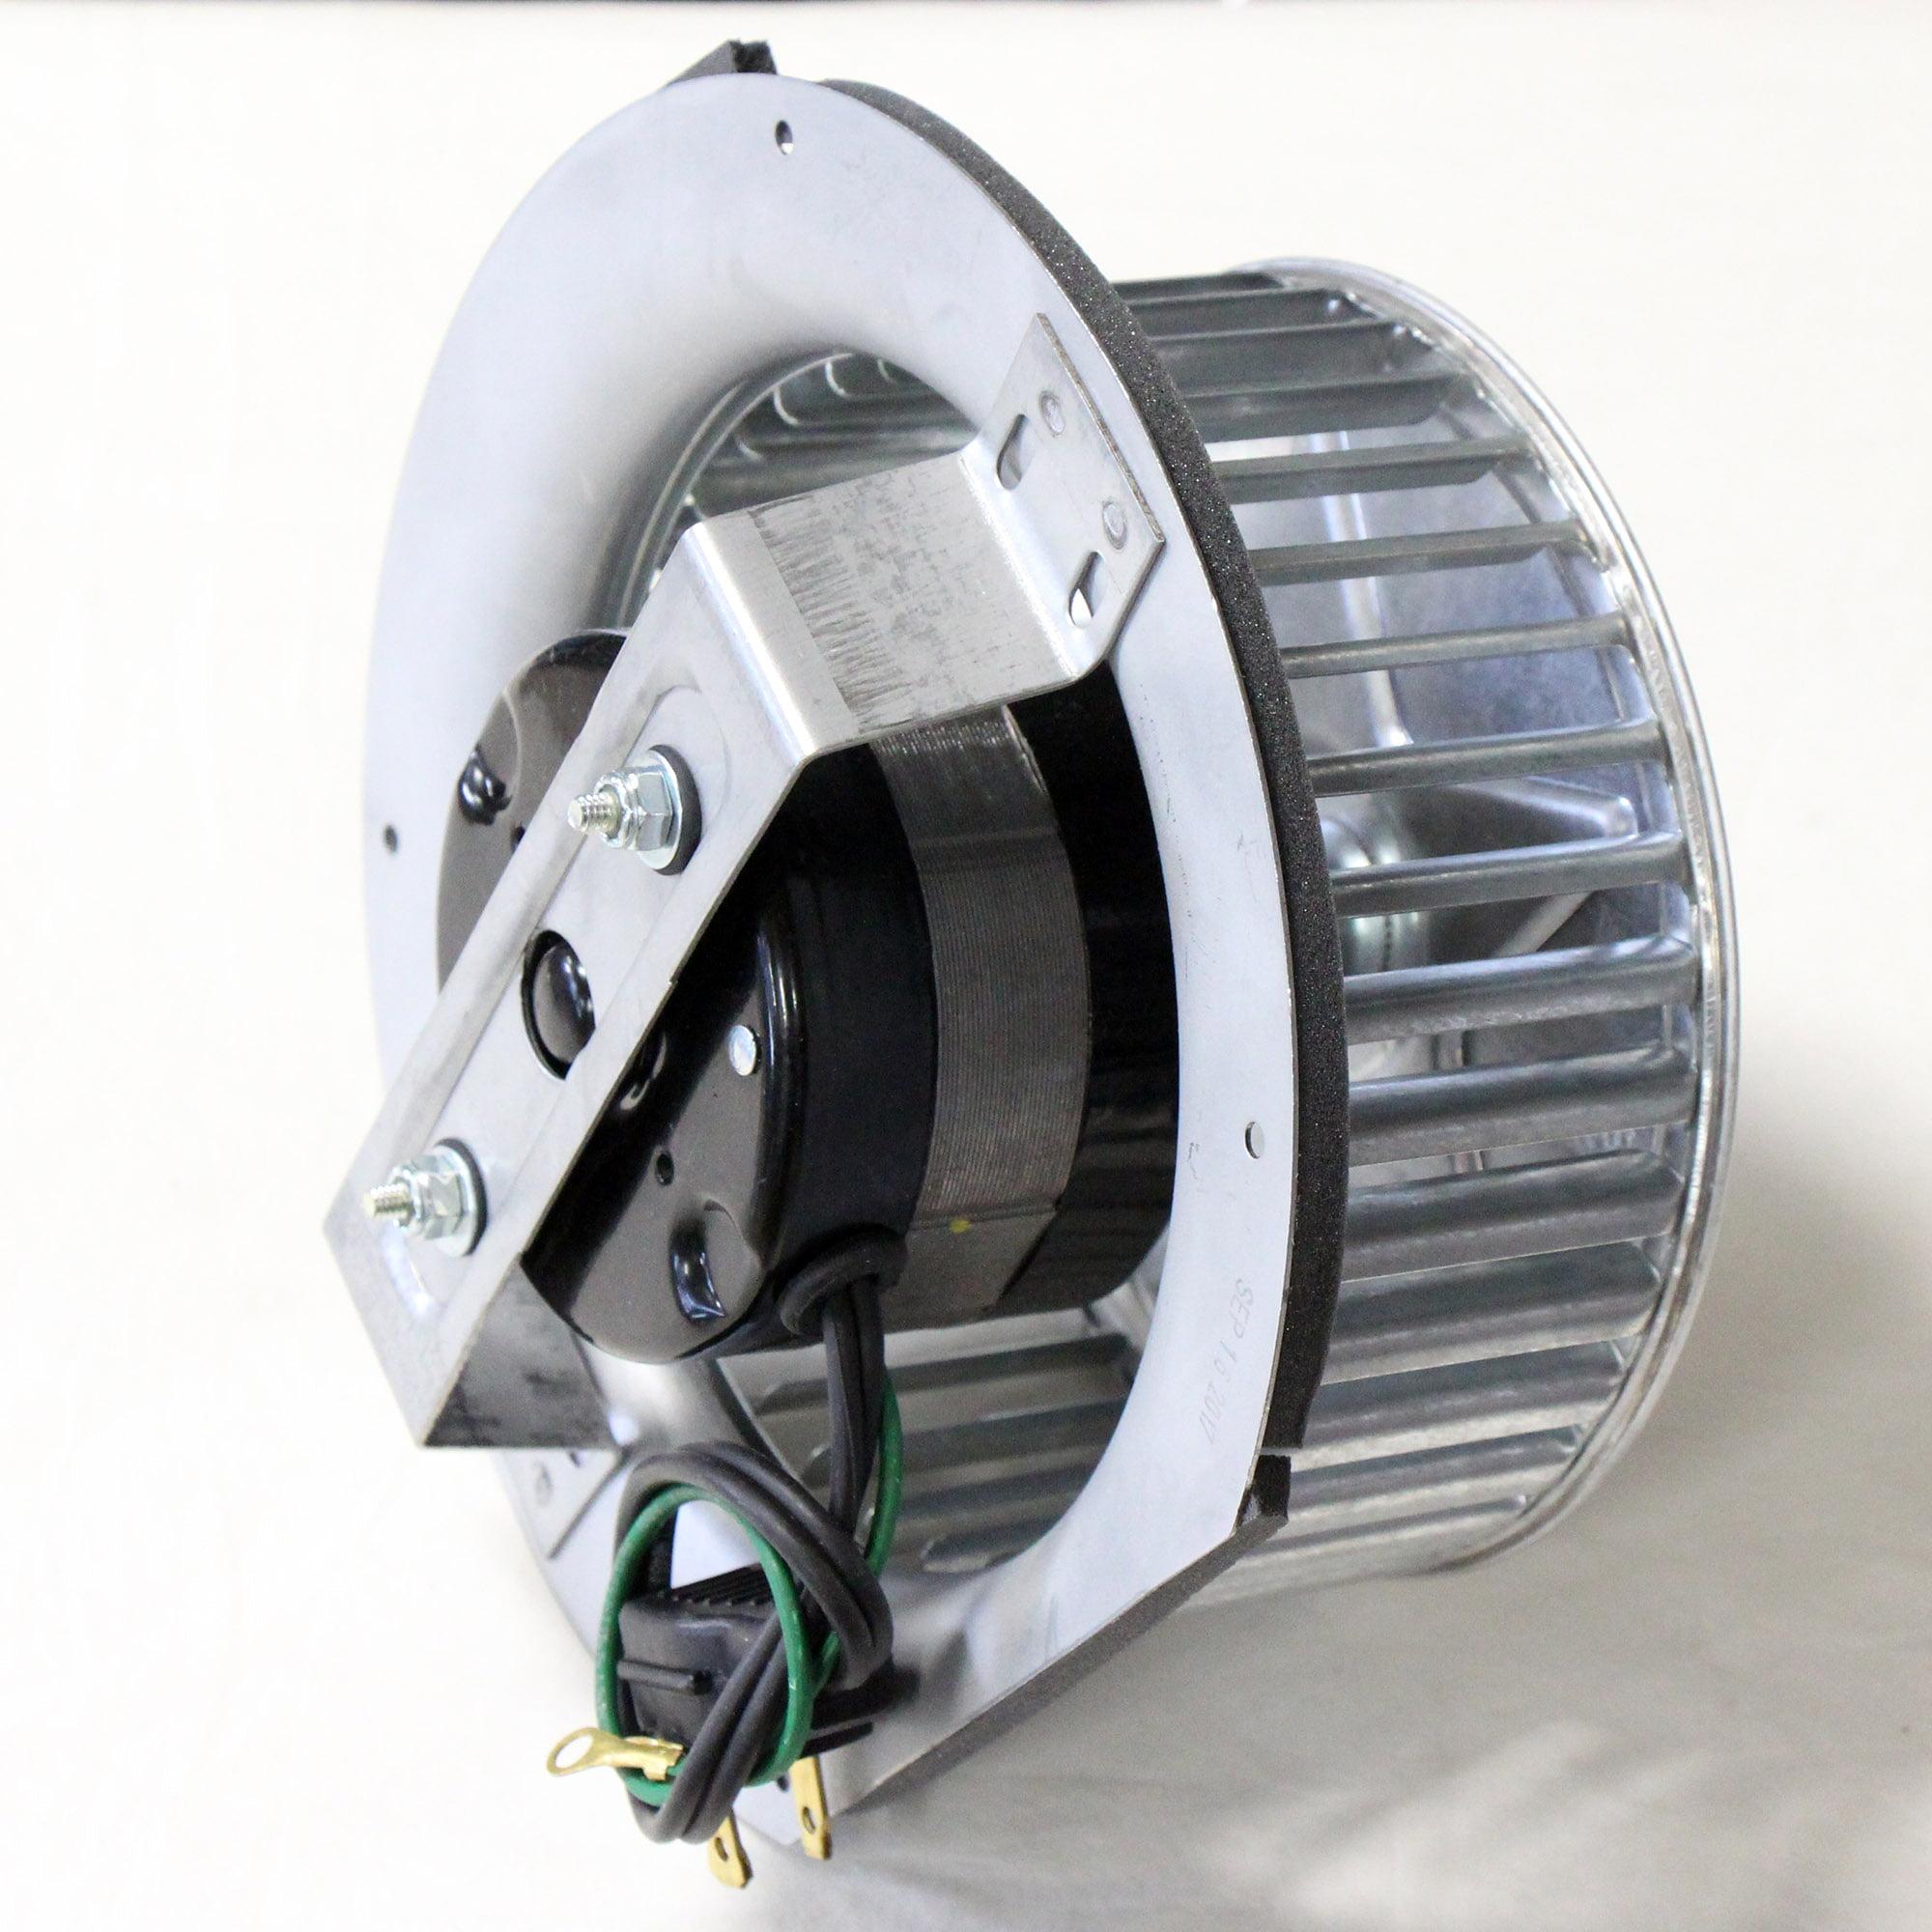 Reversomatic bathroom ventilation exhaust fan motorbladebracketqk100mbb